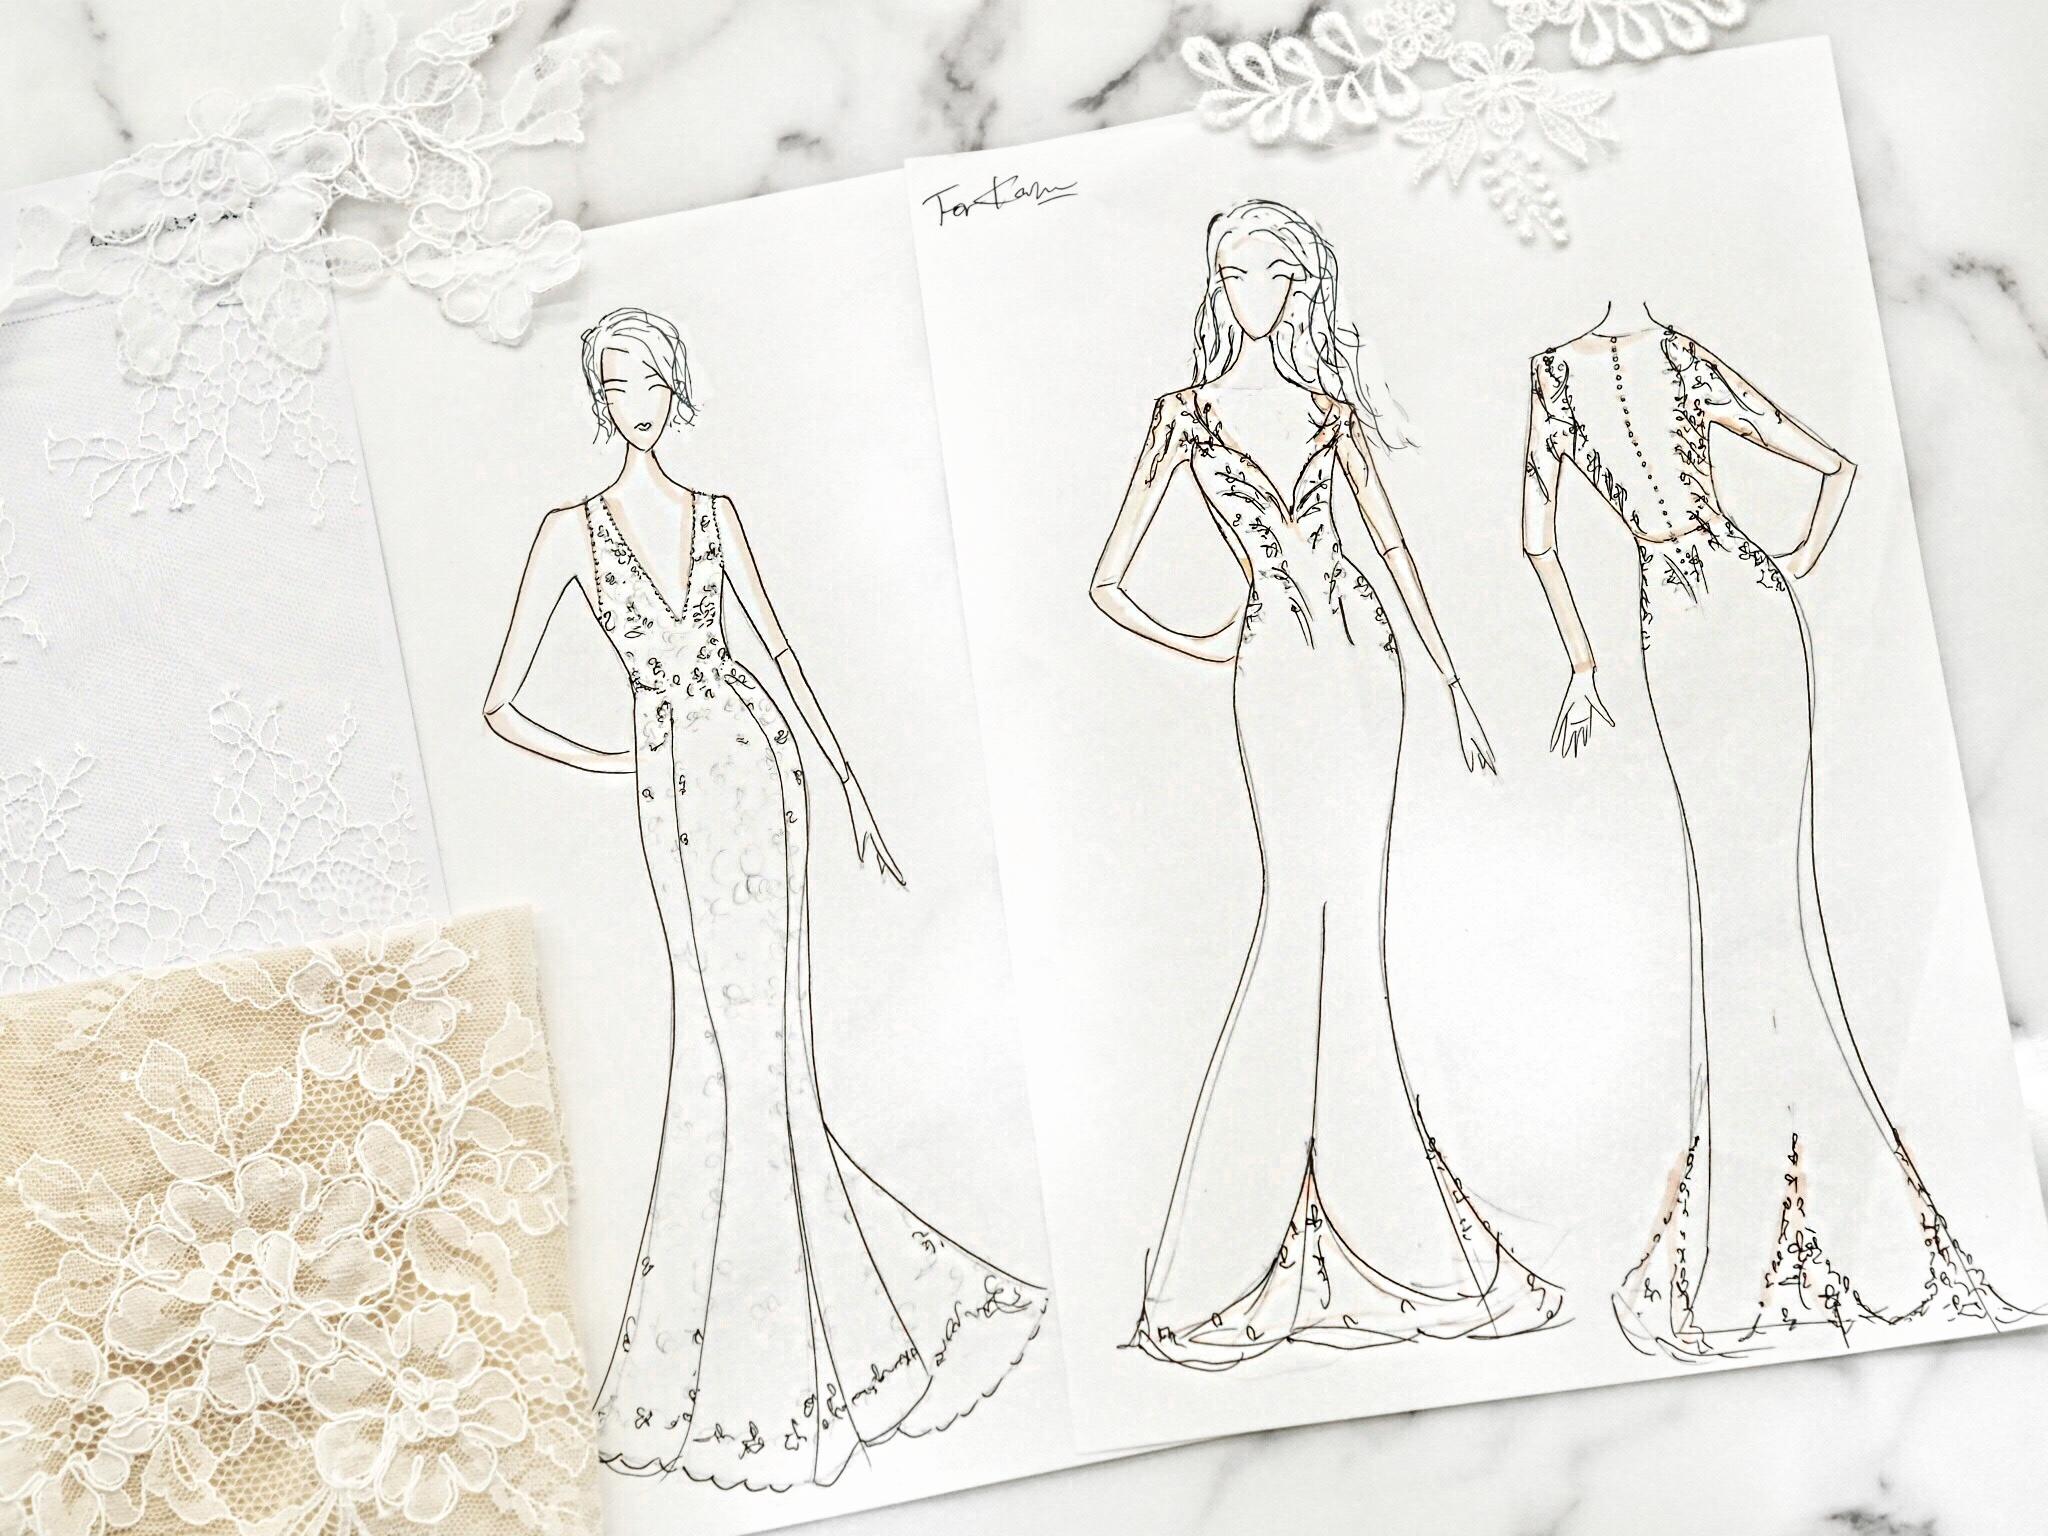 customised+bespoke+sketch+lace+wedding+dress+ccm.JPG